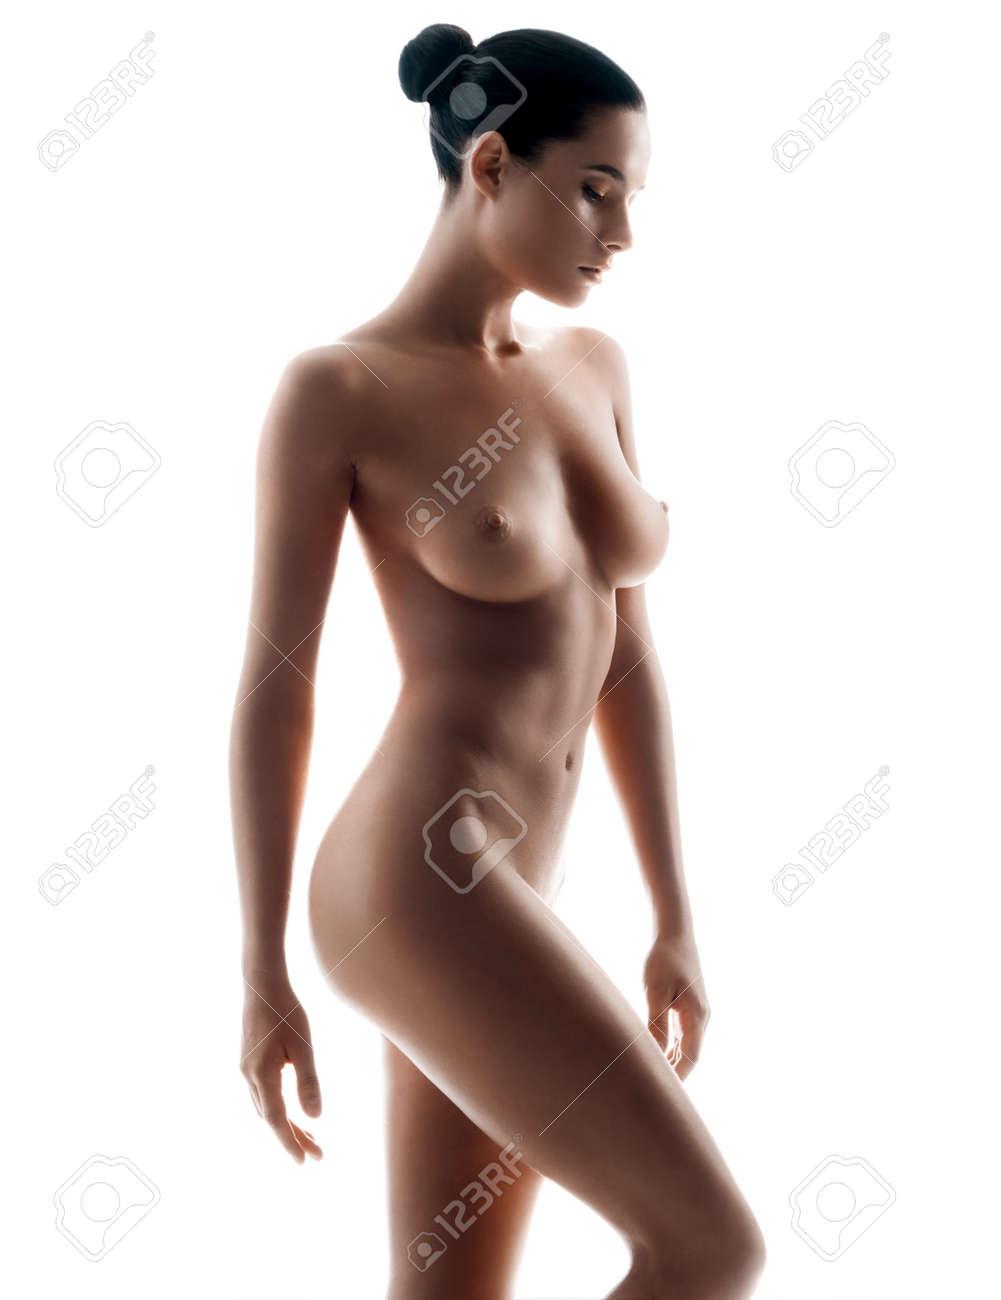 Priyanka chopra porn new album